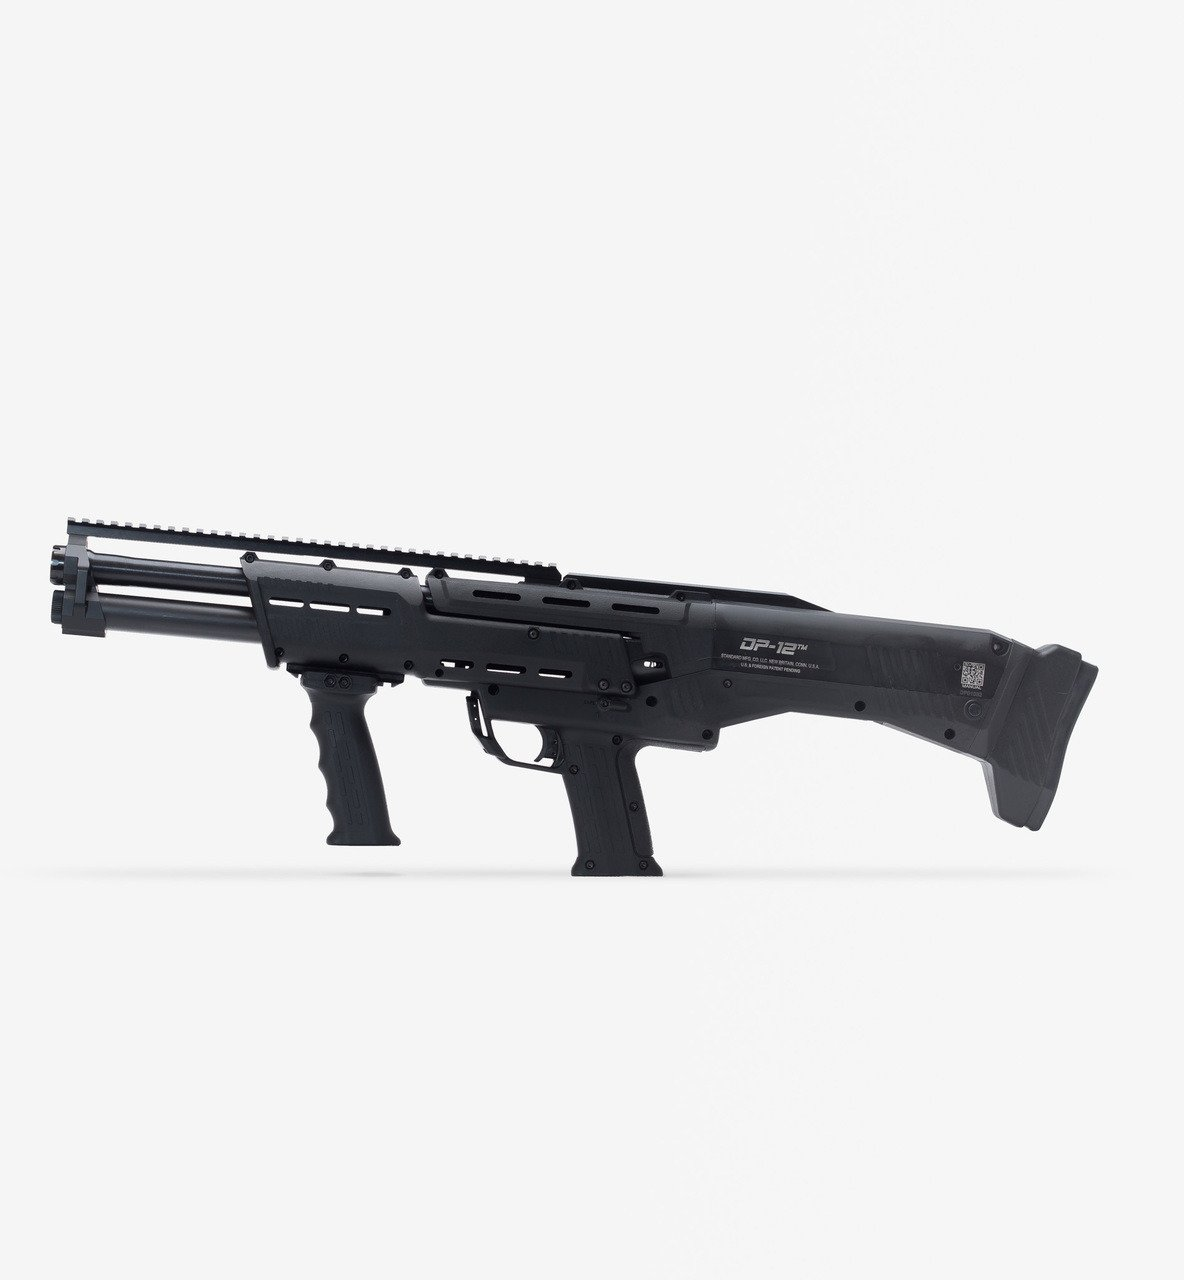 Standard Manufacturing DP-12 Double Barrel 12 Gauge Pump Action Shotgun - view number 1